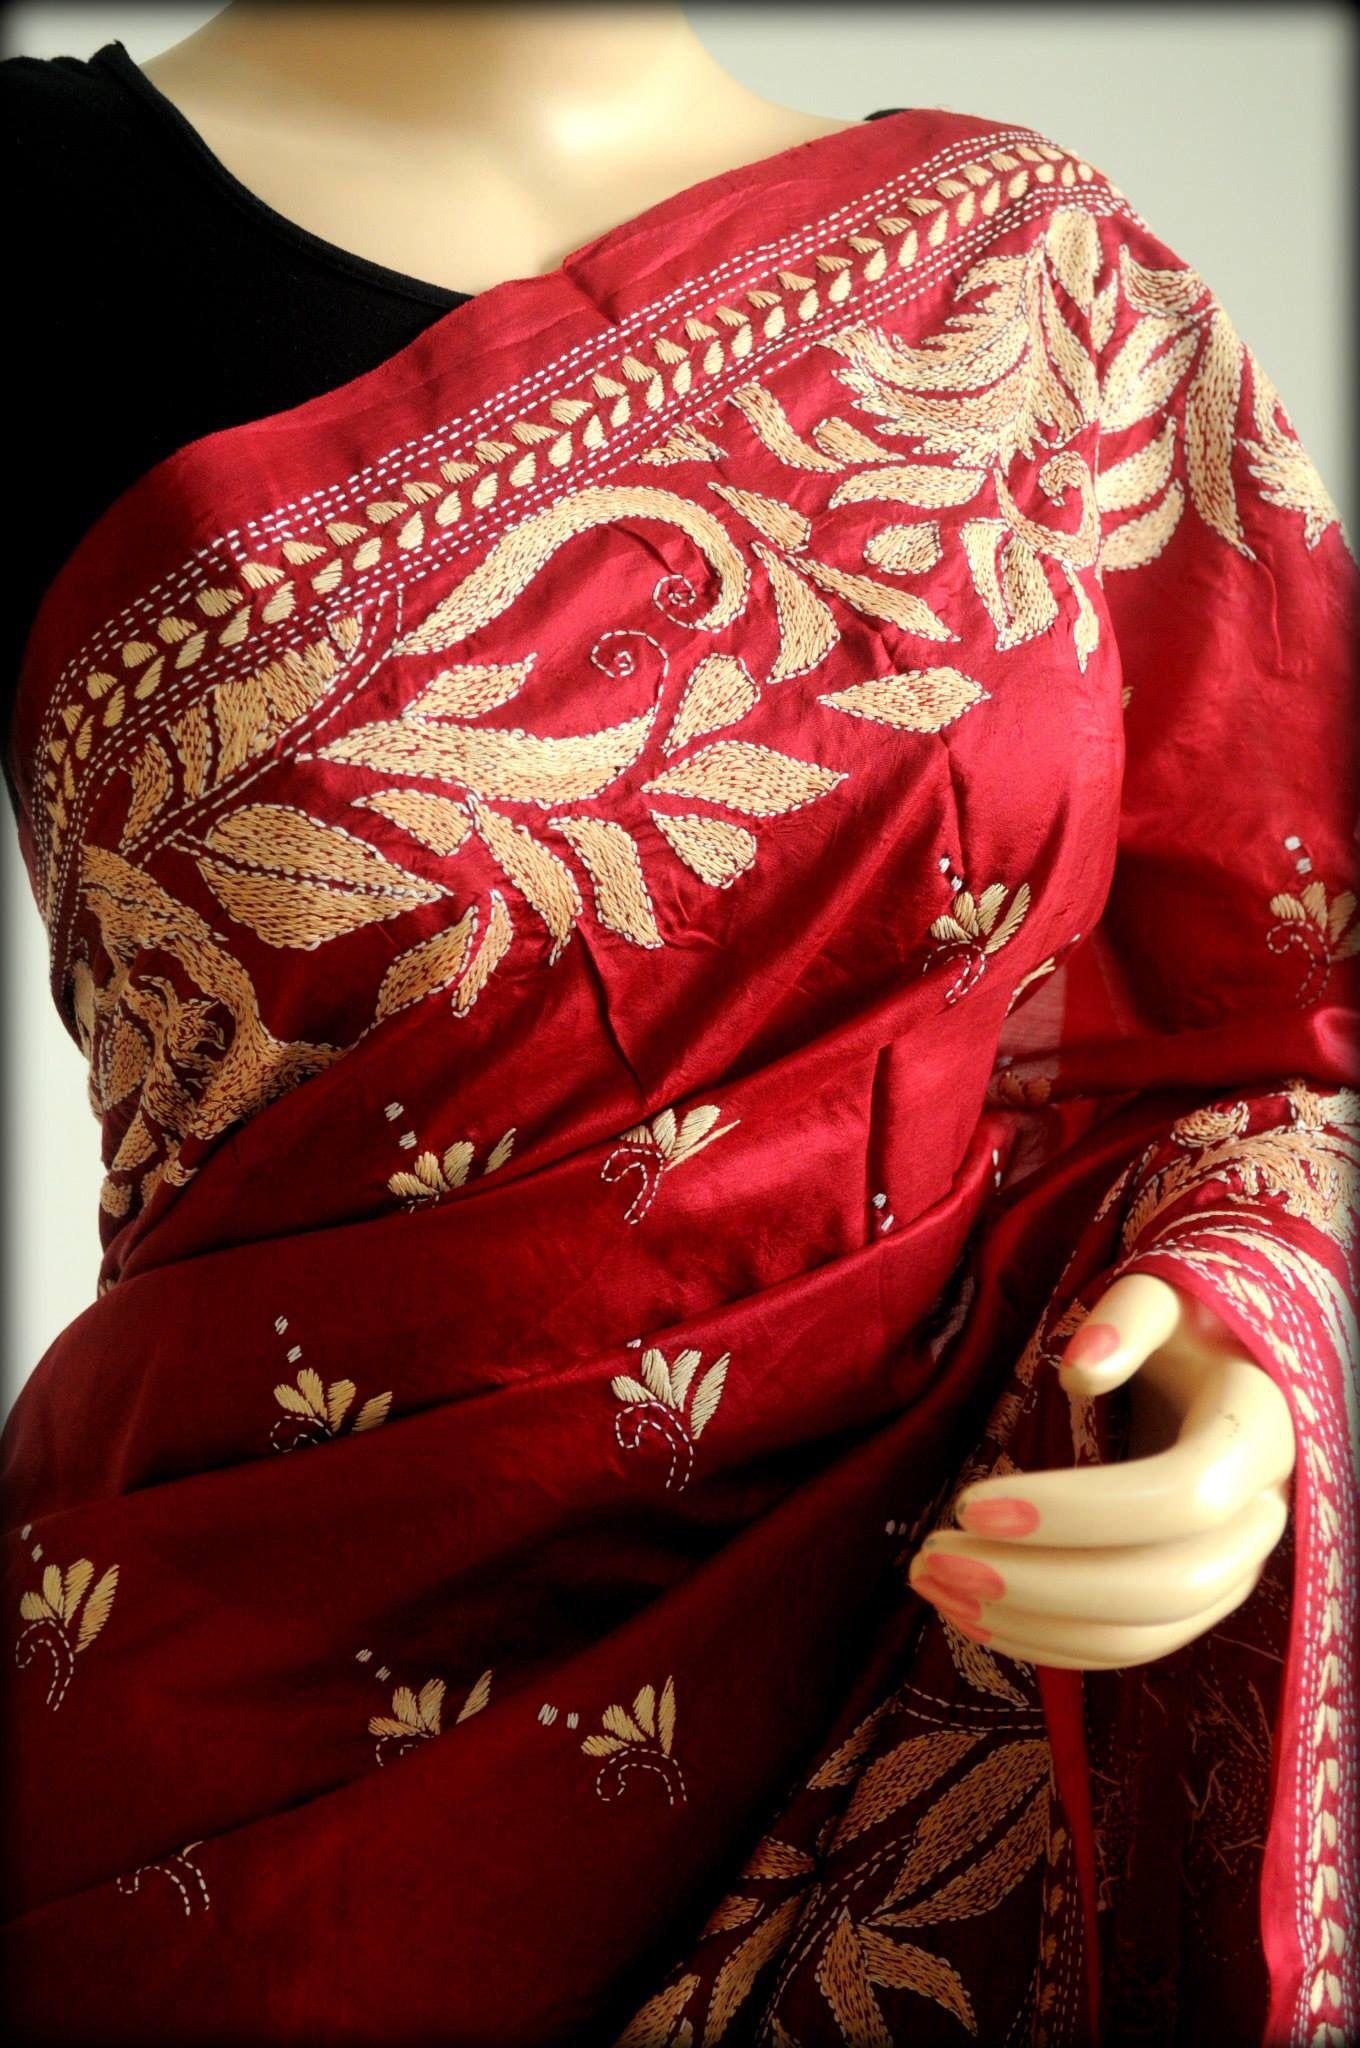 e6bfe500b1ff6 Red Bangalore silk kantha saree